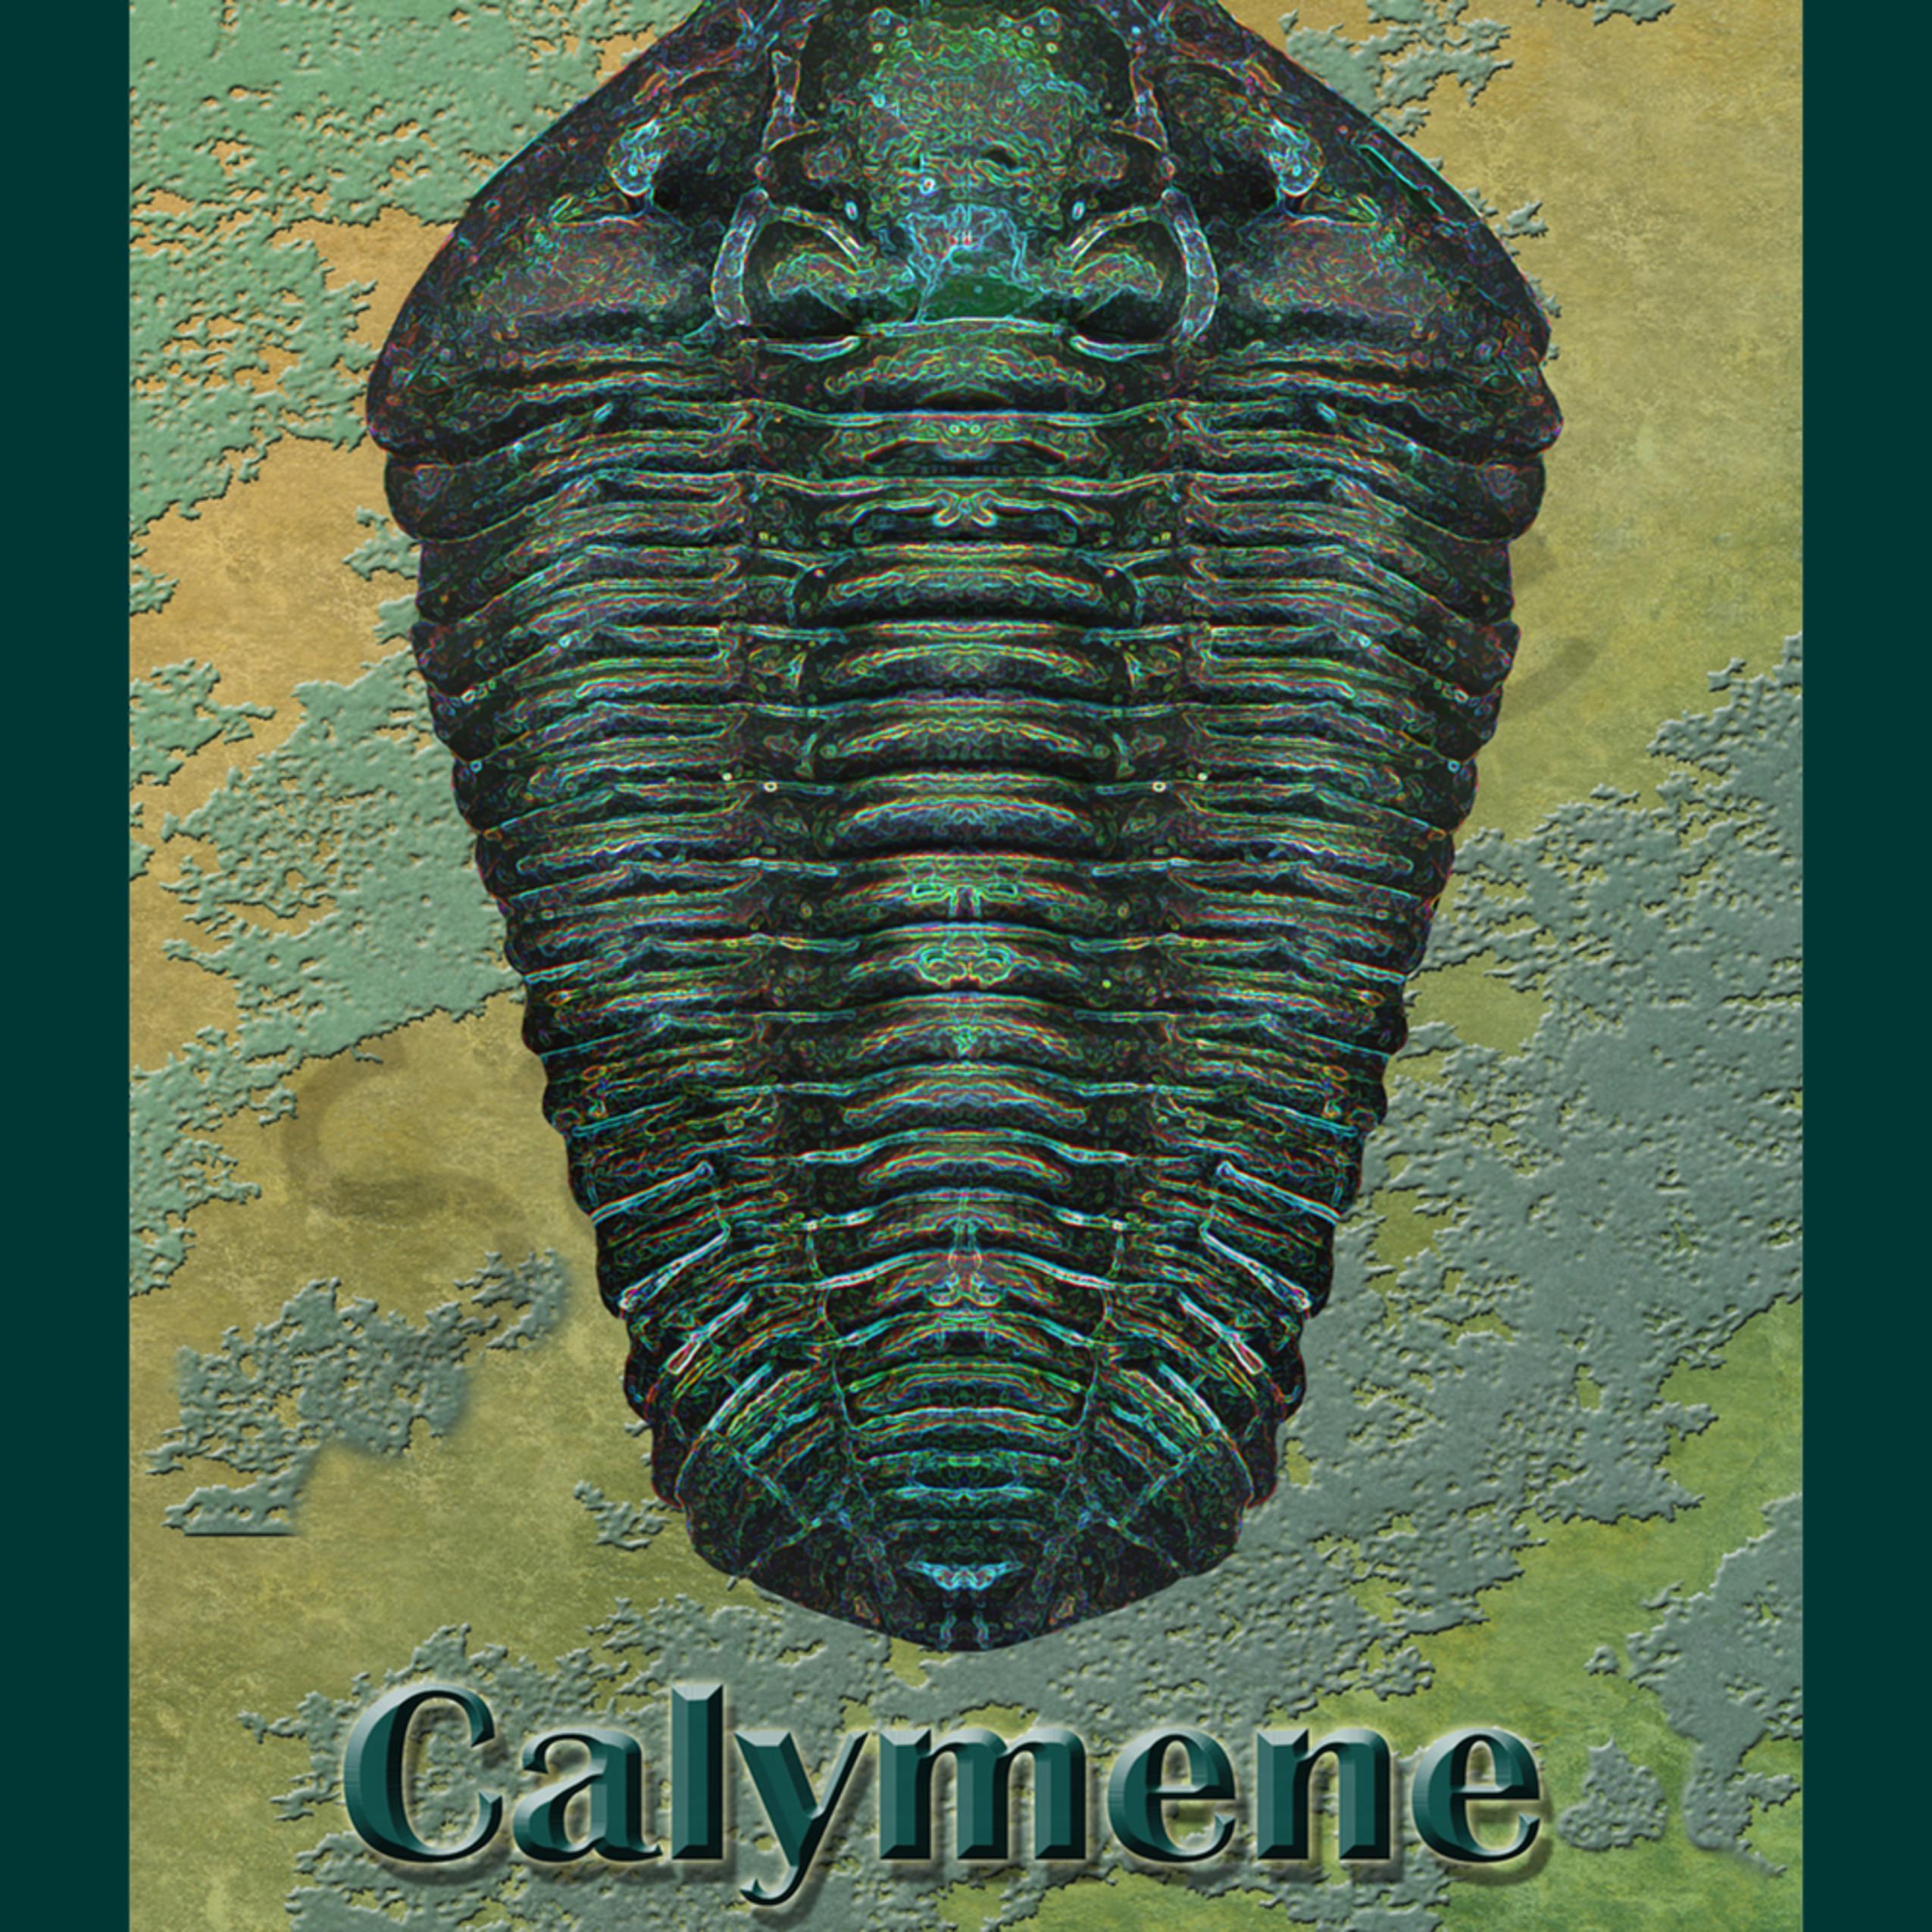 Calymene 8.5 x 11 nxowpo